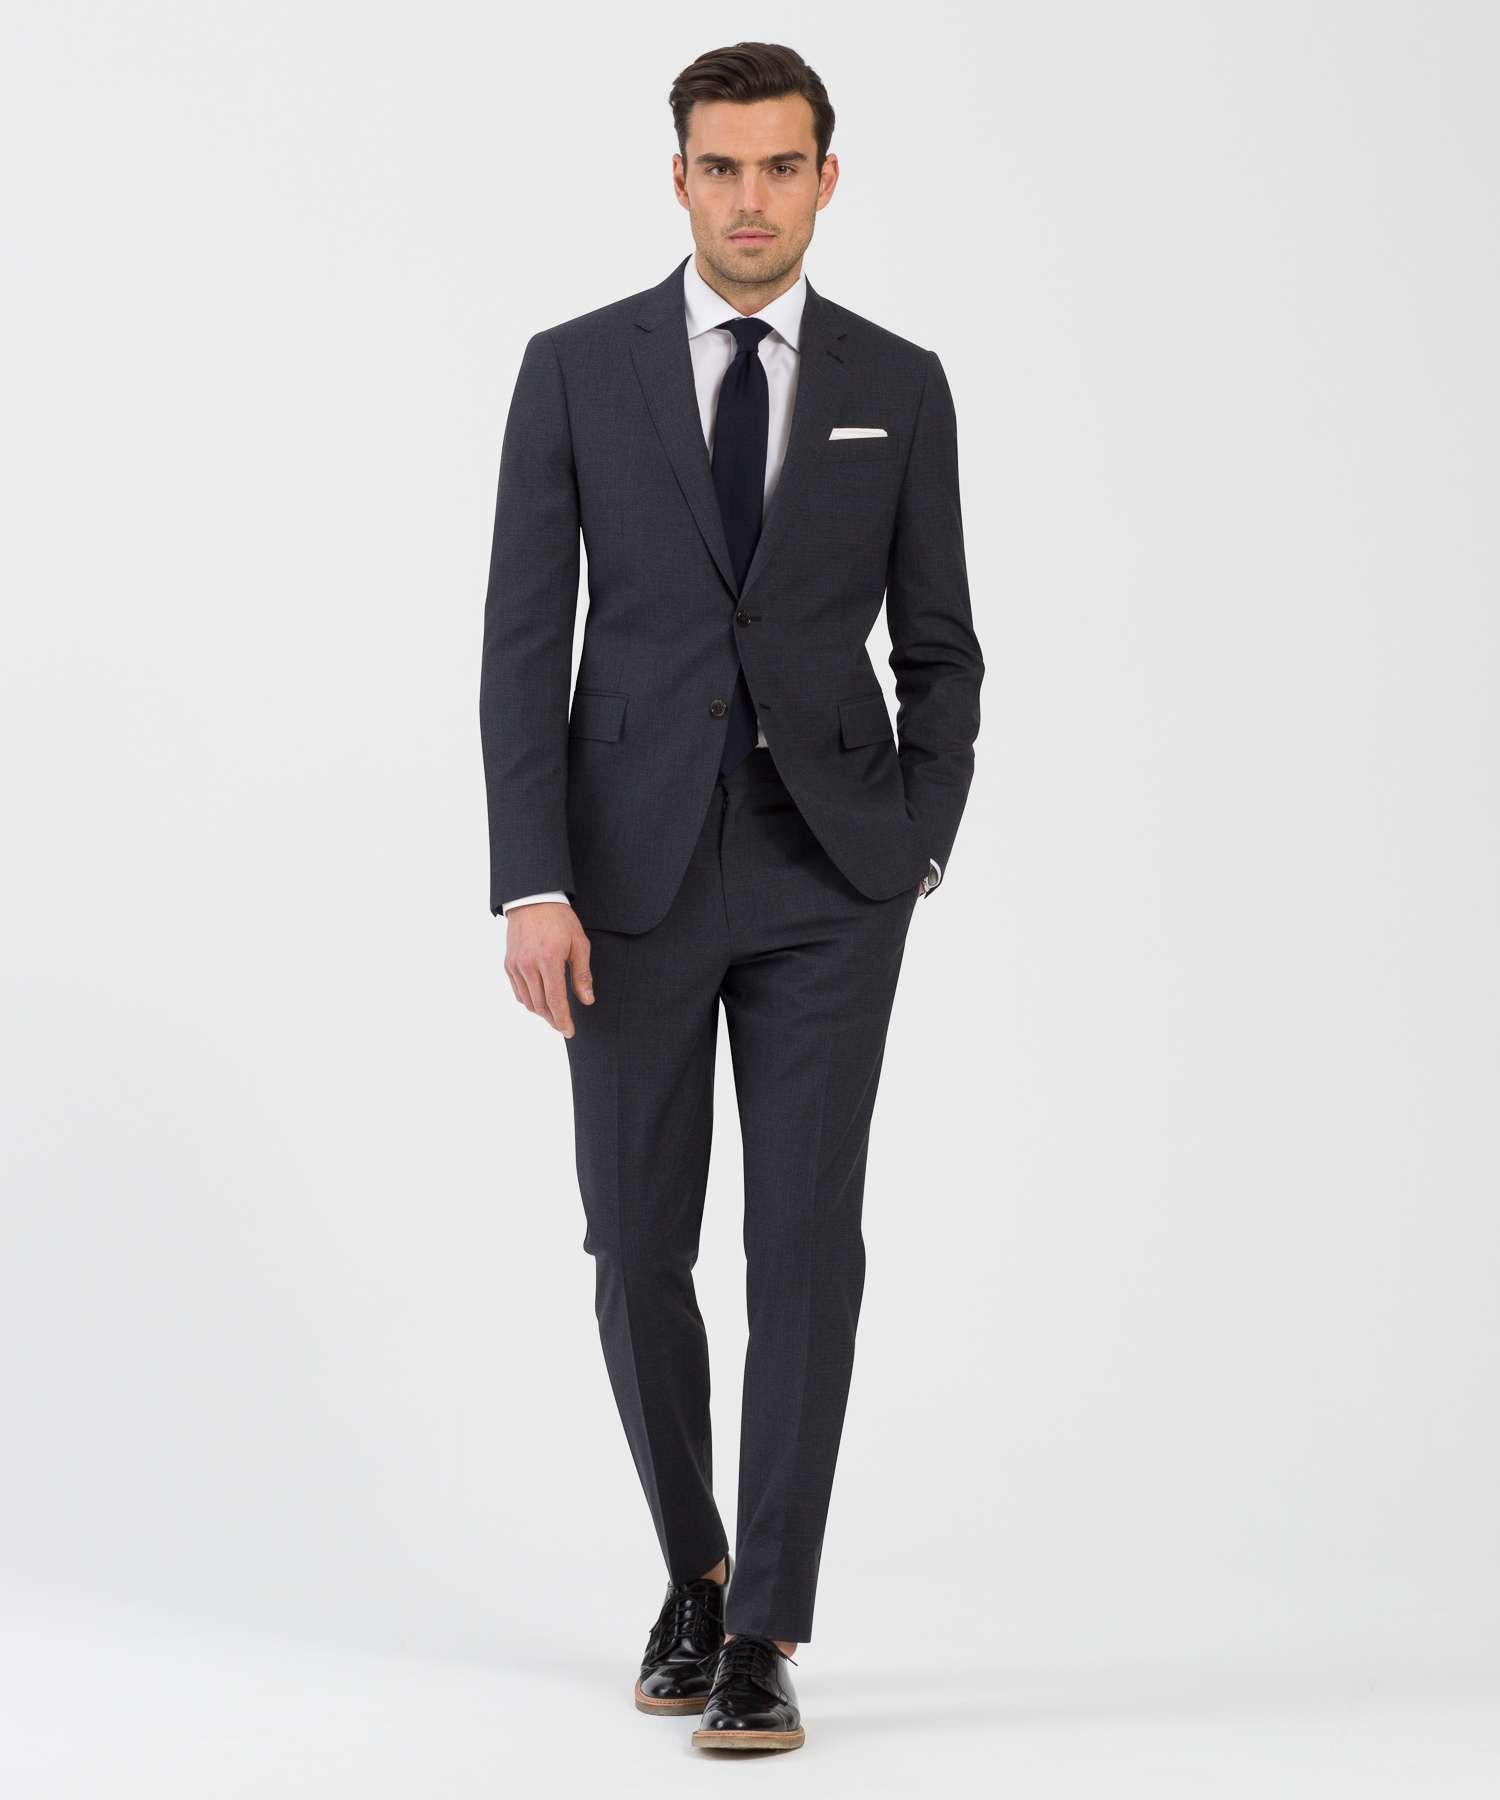 Dark Grey Plaid Suit | My Dress Tip